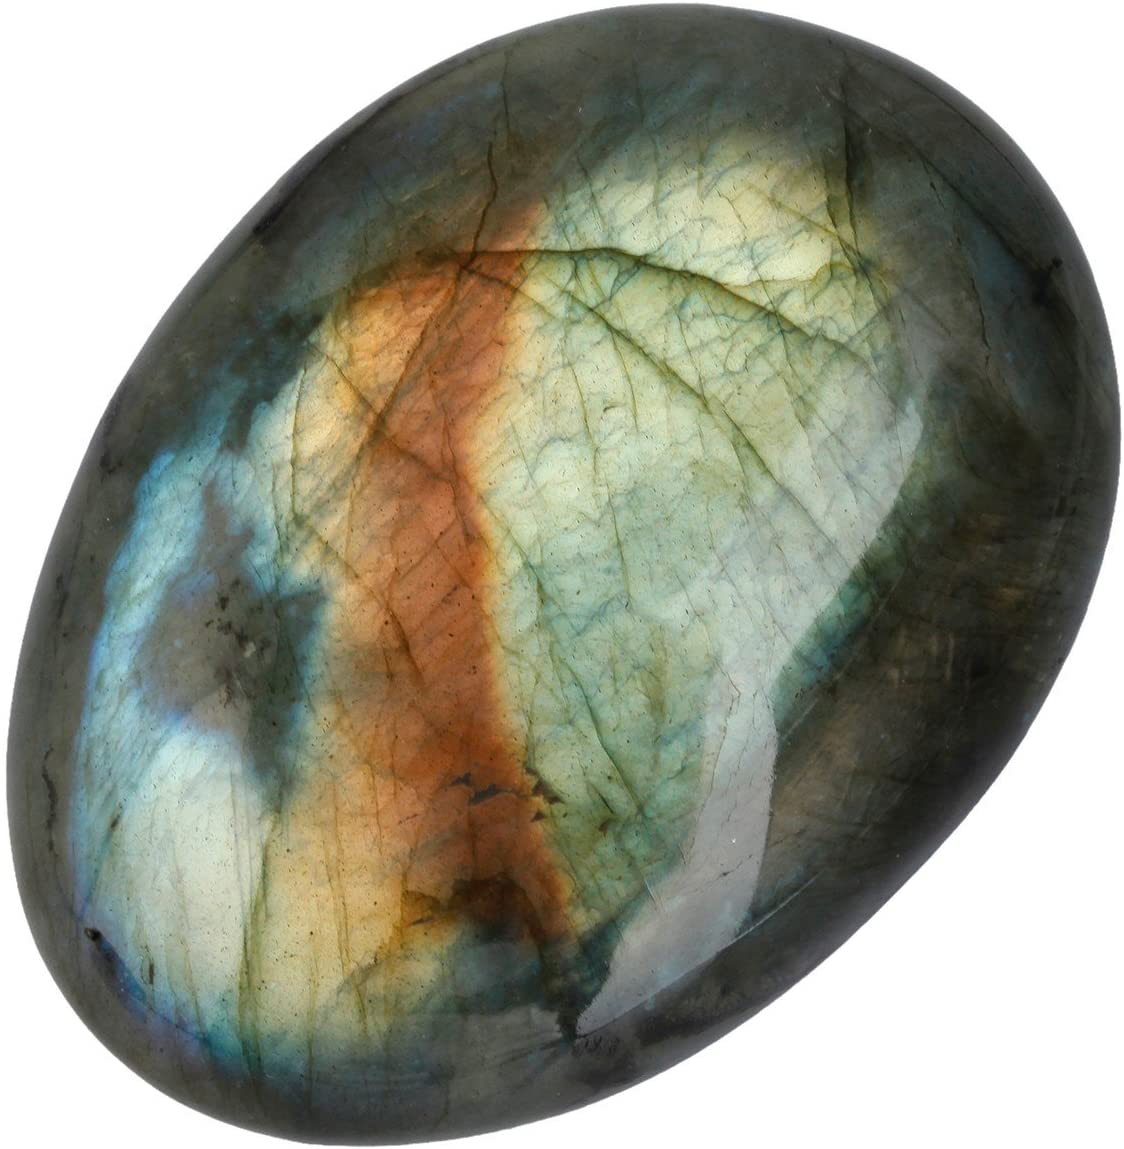 rockcloud Irregular Polished Labradorite Palm Stones Worry Stones Pebble Healing Crystal with Velvet Bag